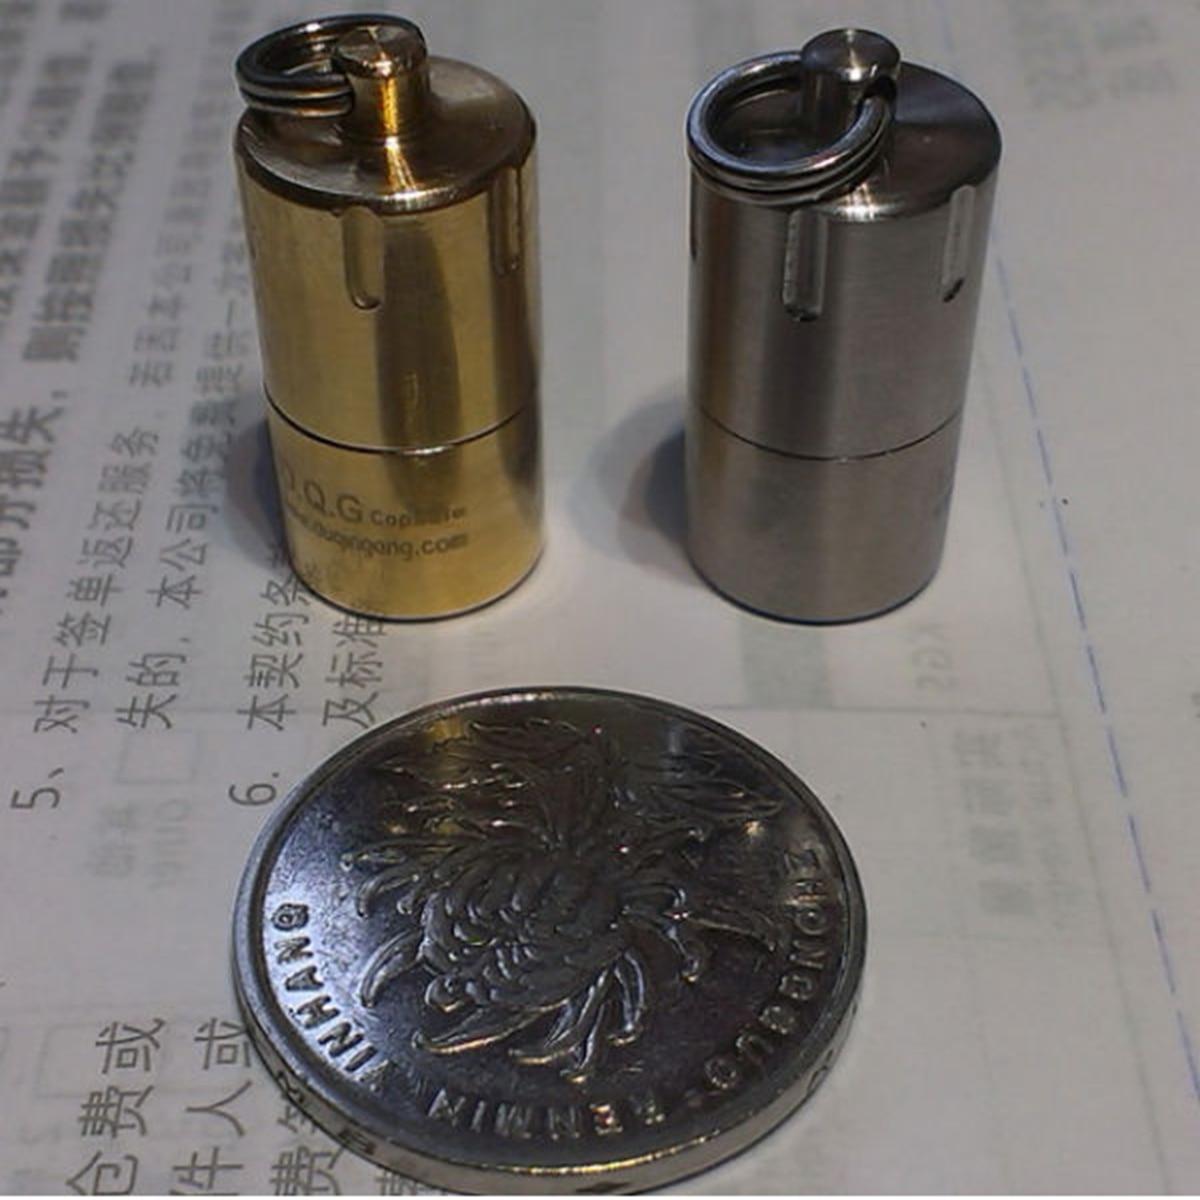 DQG Capsule Mini Waterproof Keychain Storage For 10180 Battery